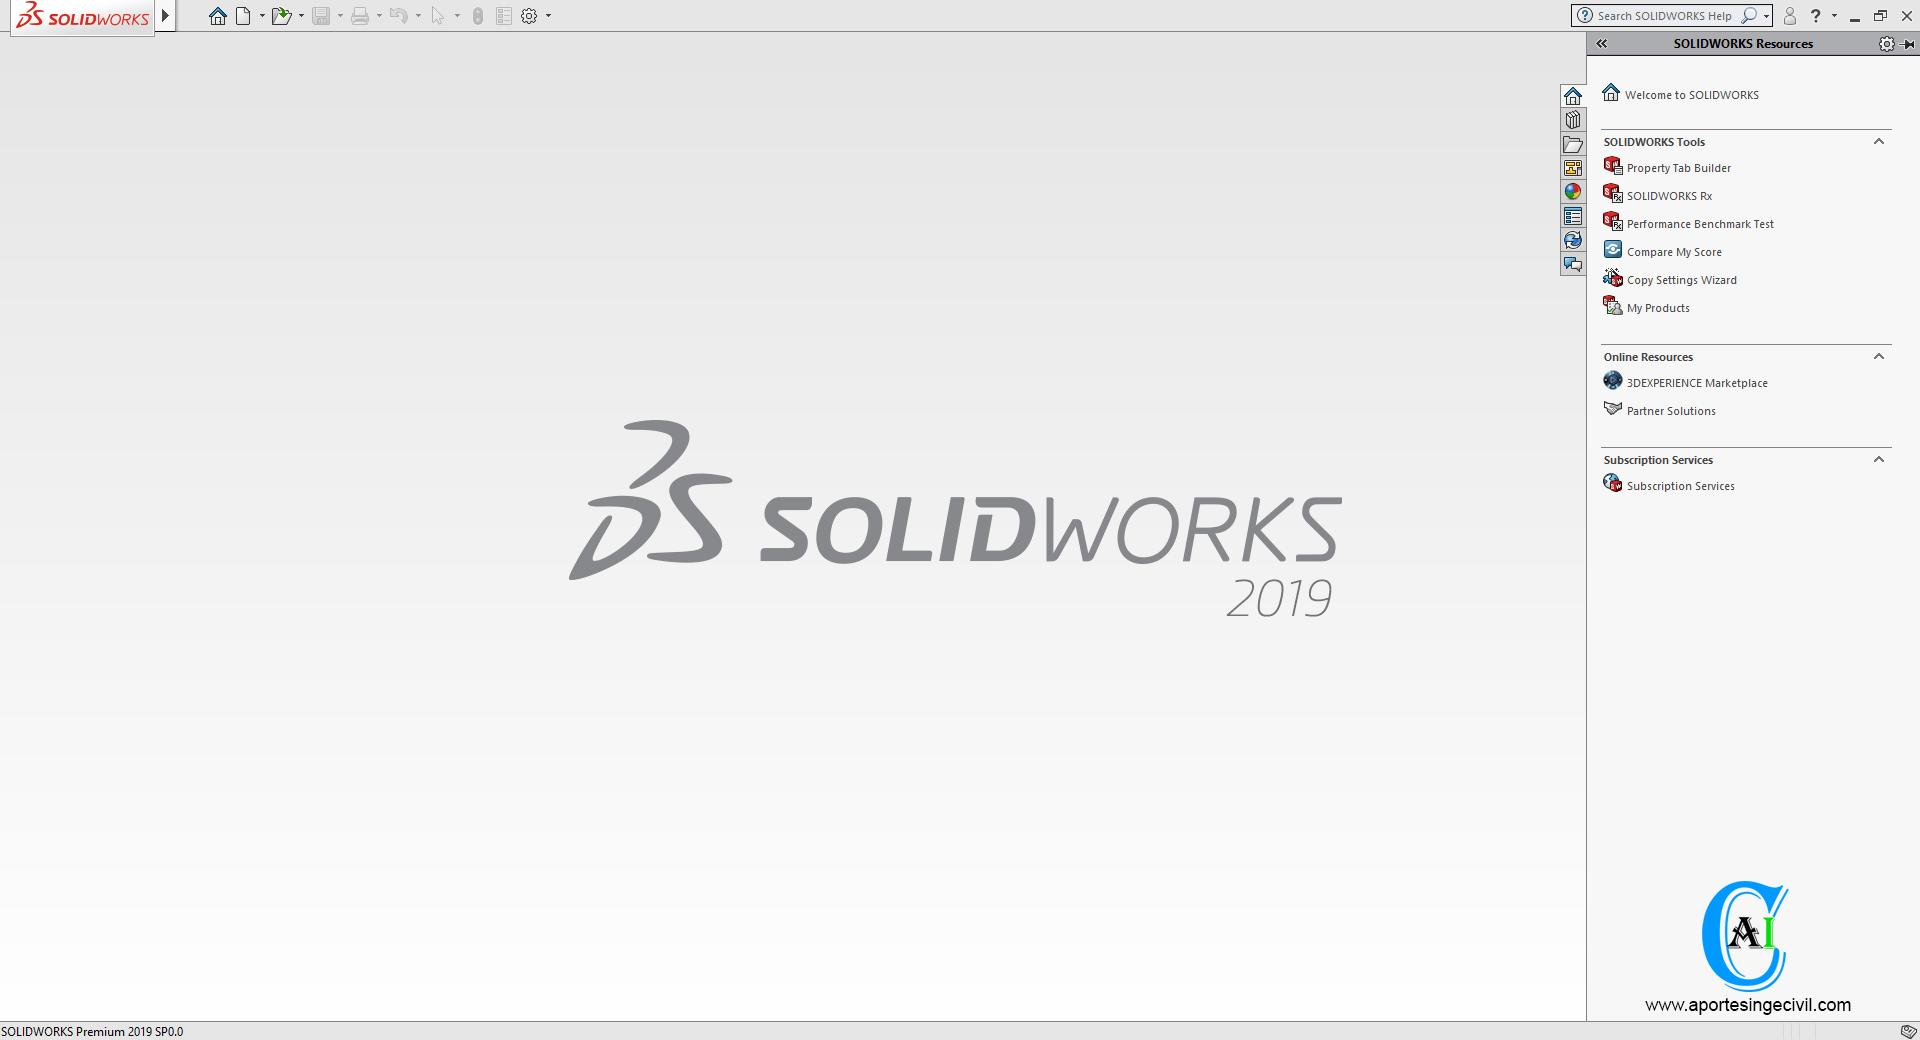 Descargar SolidWorks 2019 Premium